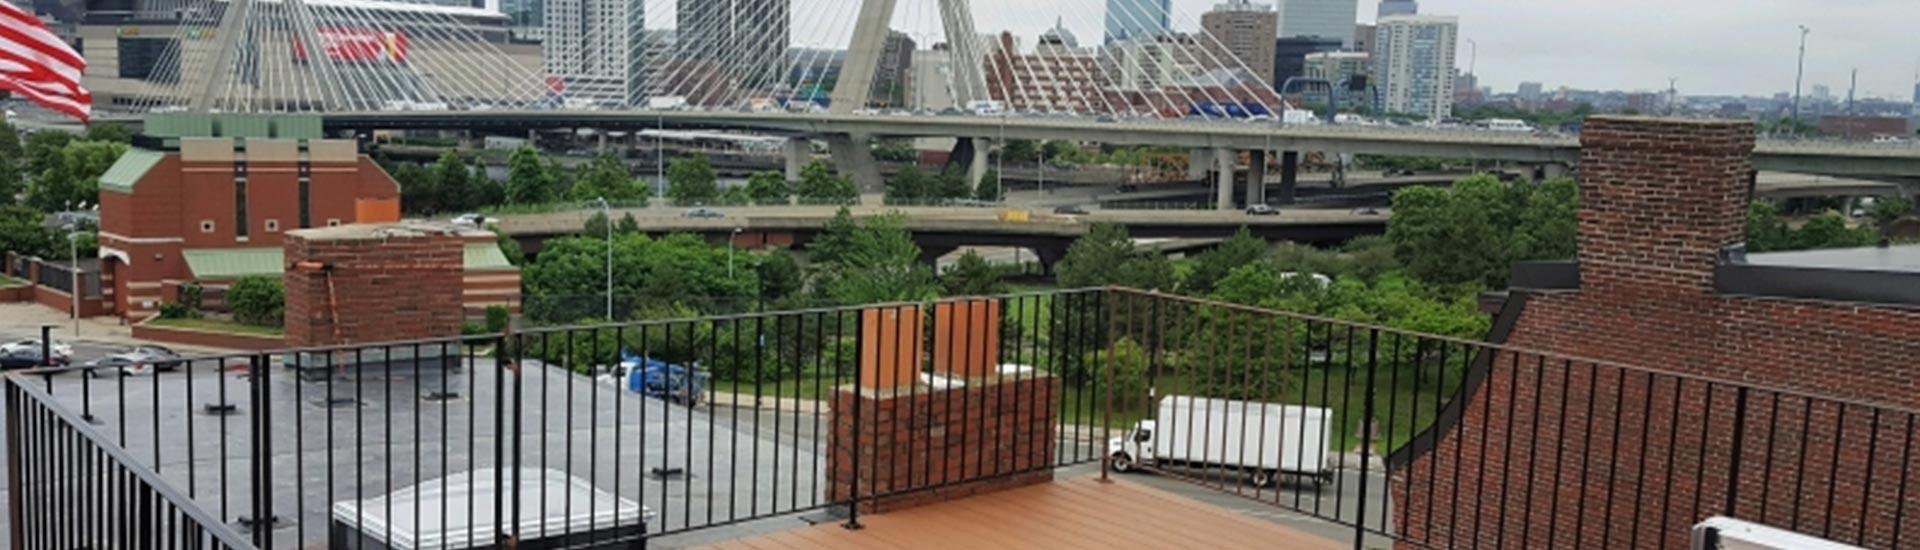 roof-deck-5